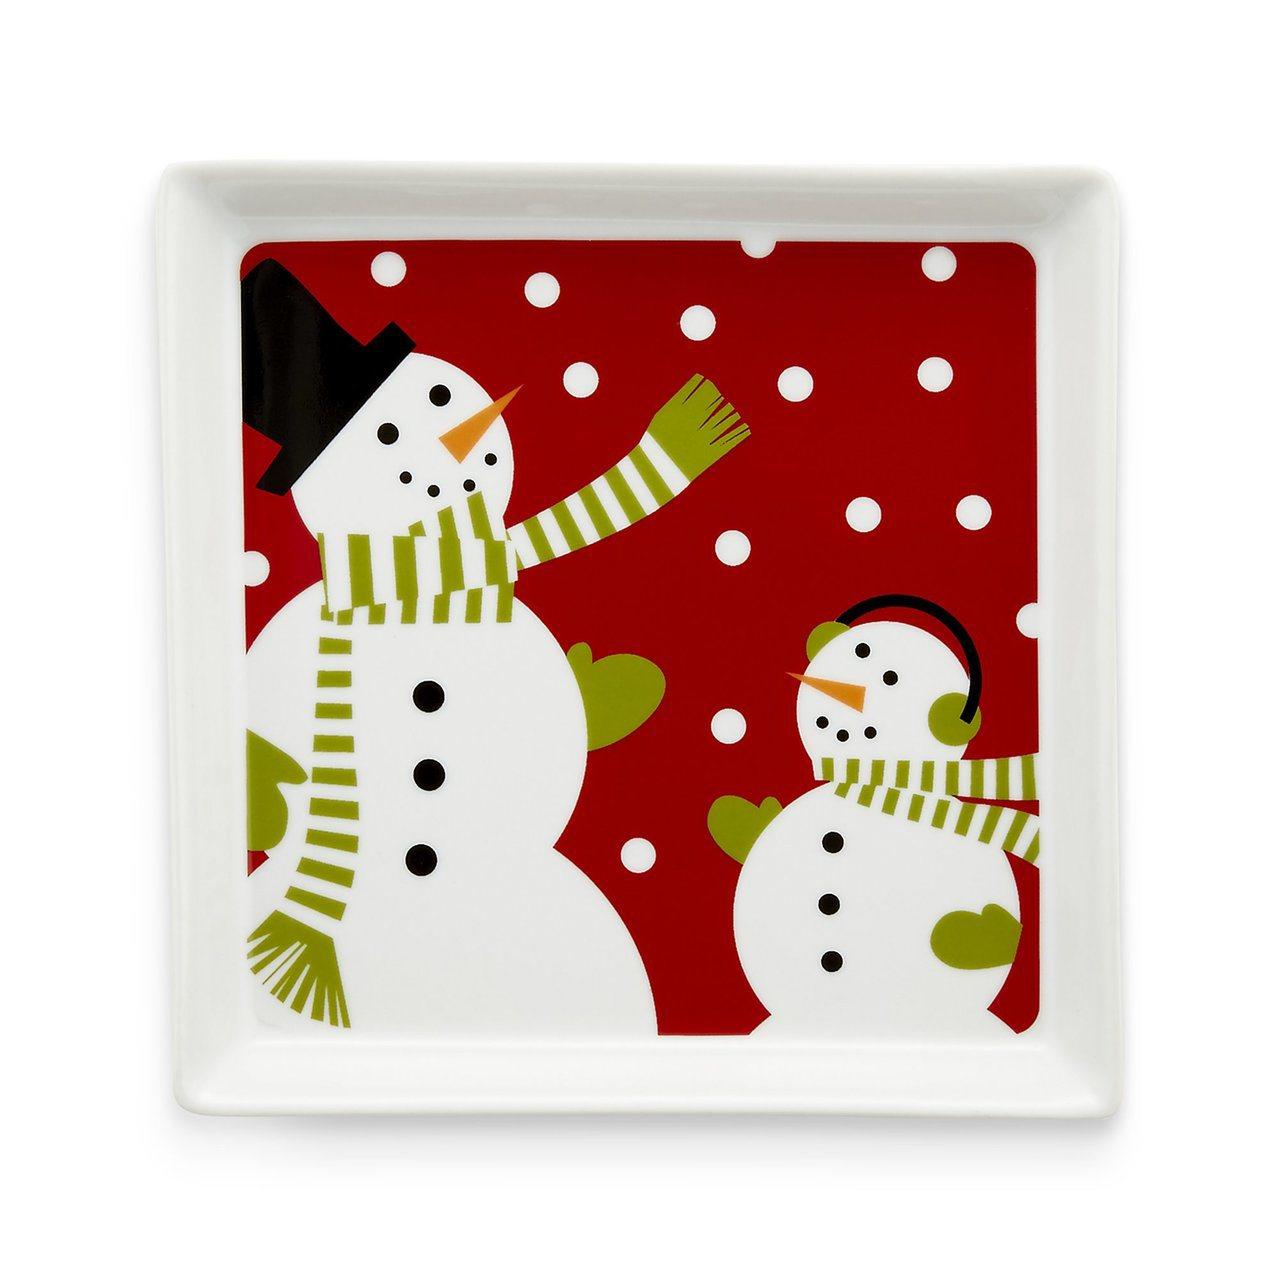 Snowman餐盤展現過節歡樂氣氛。圖/Crate and Barrel提供